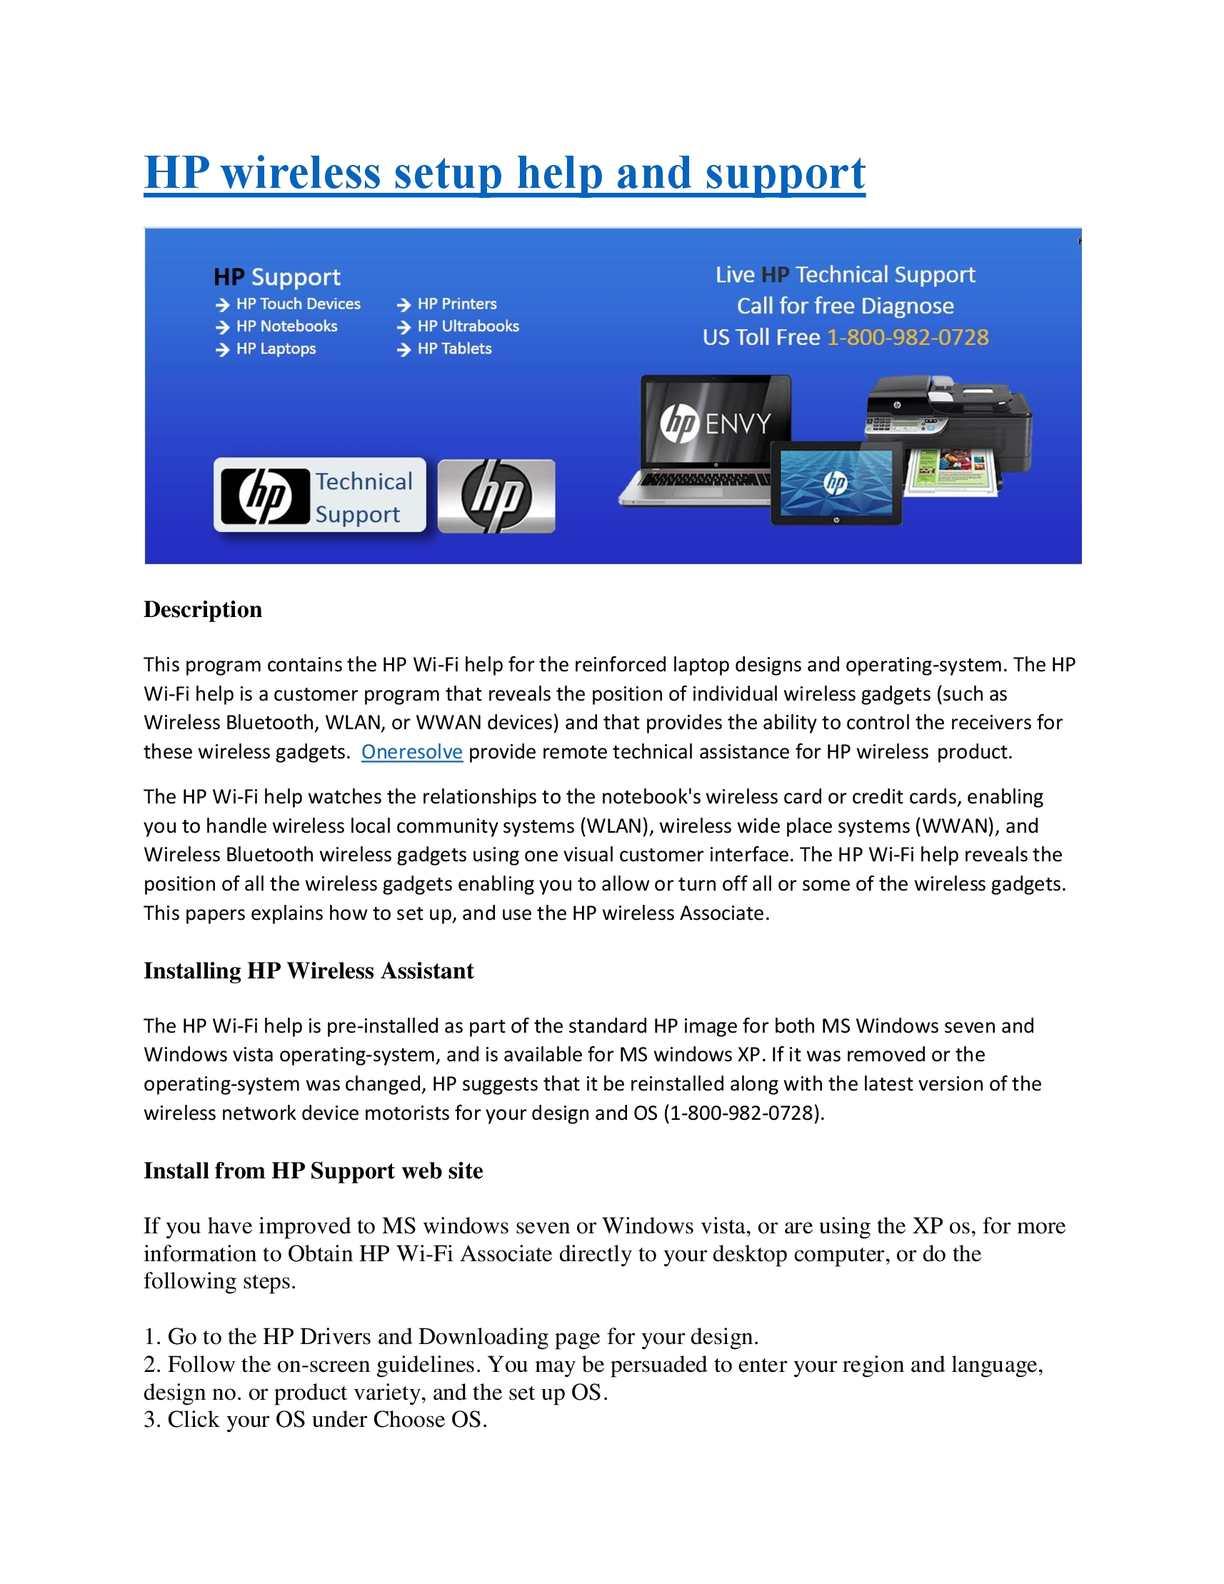 Hp and compaq desktop pcs video: resolving sound problems.